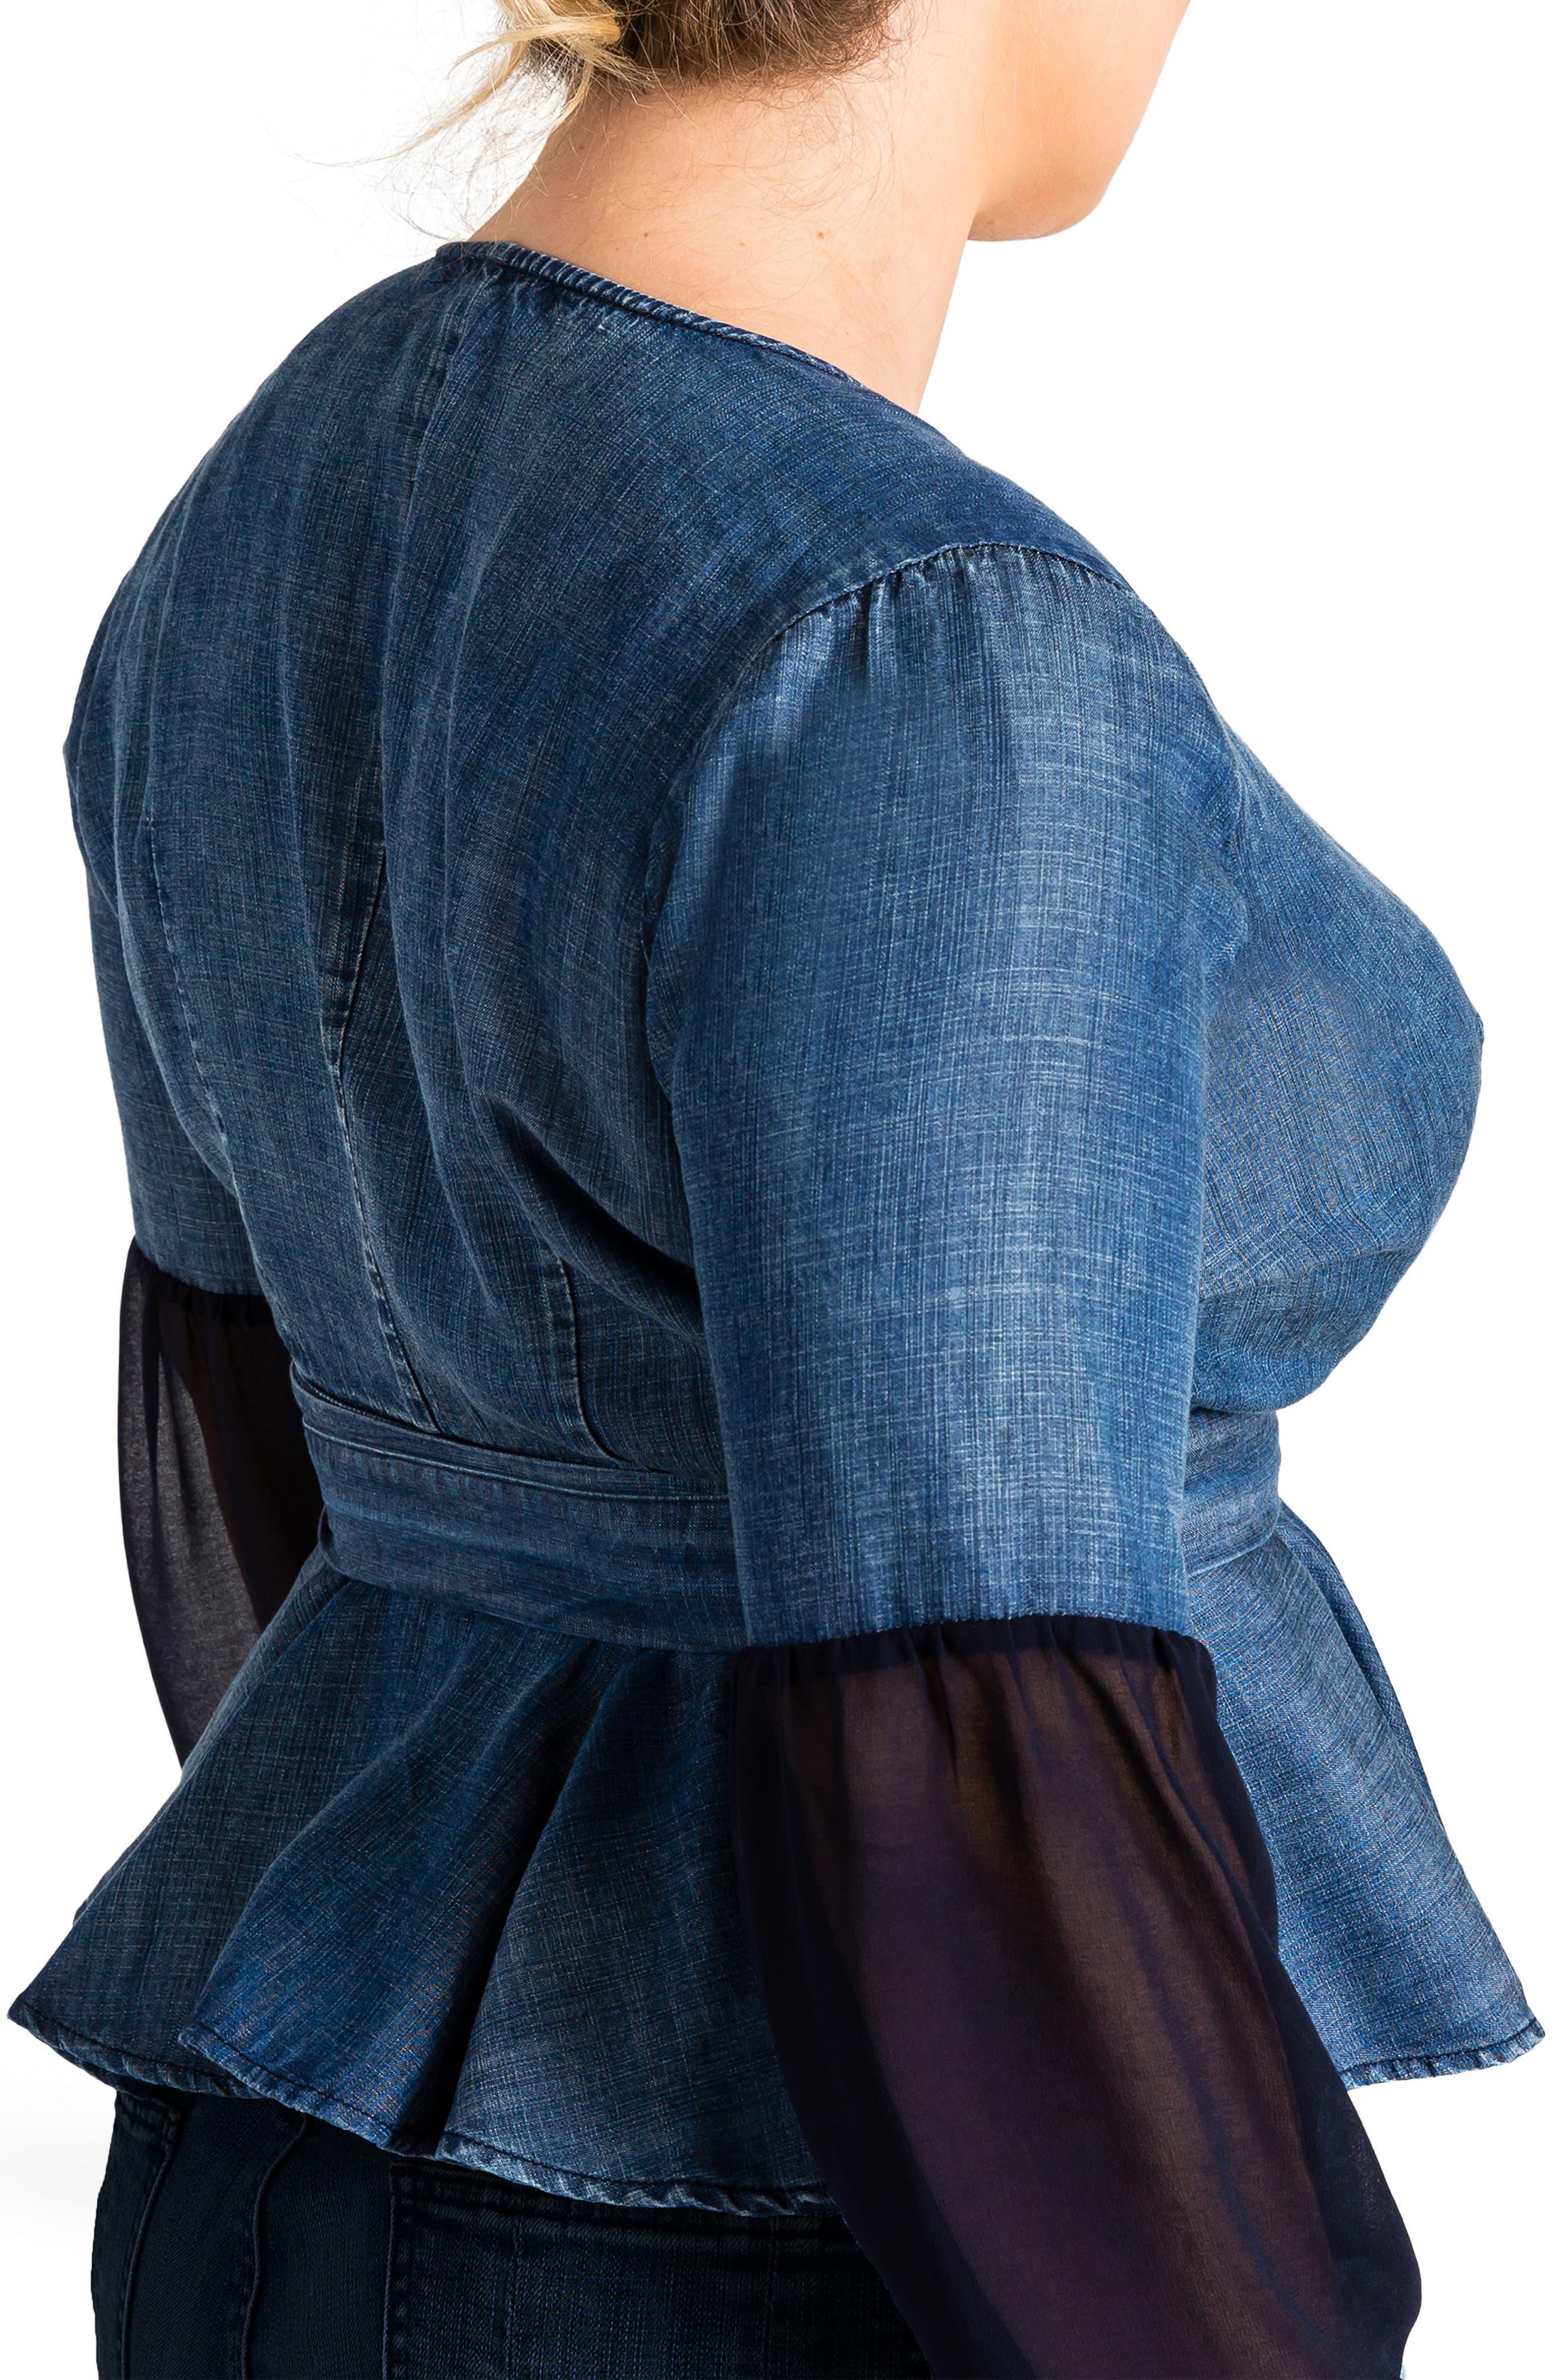 Letty Peplum Wrap Top,                             Alternate thumbnail 2, color,                             Medium Blue